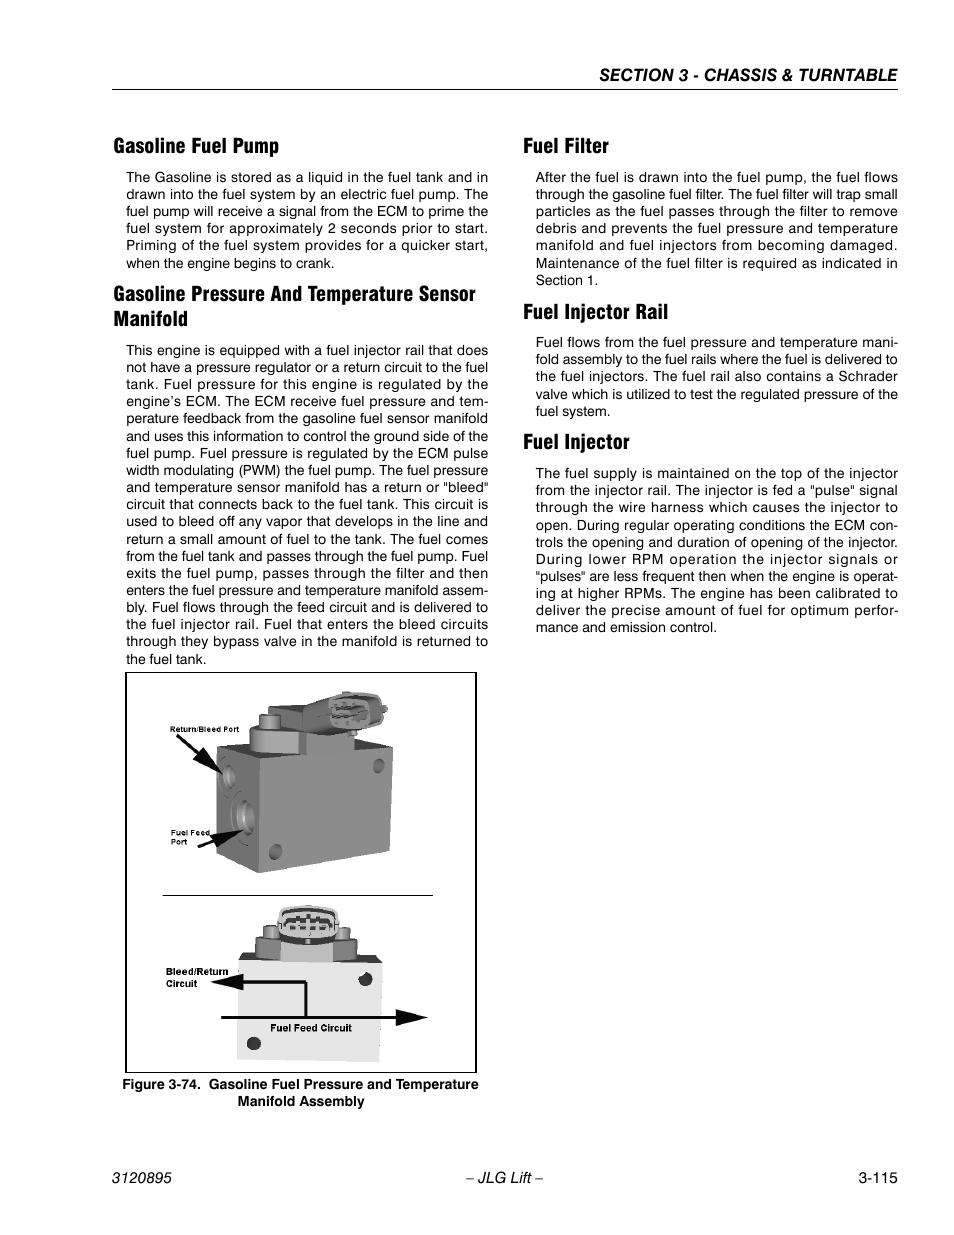 gasoline fuel pump, gasoline pressure and temperature sensor manifold, fuel  filter | jlg 460sj service manual user manual | page 167 / 462